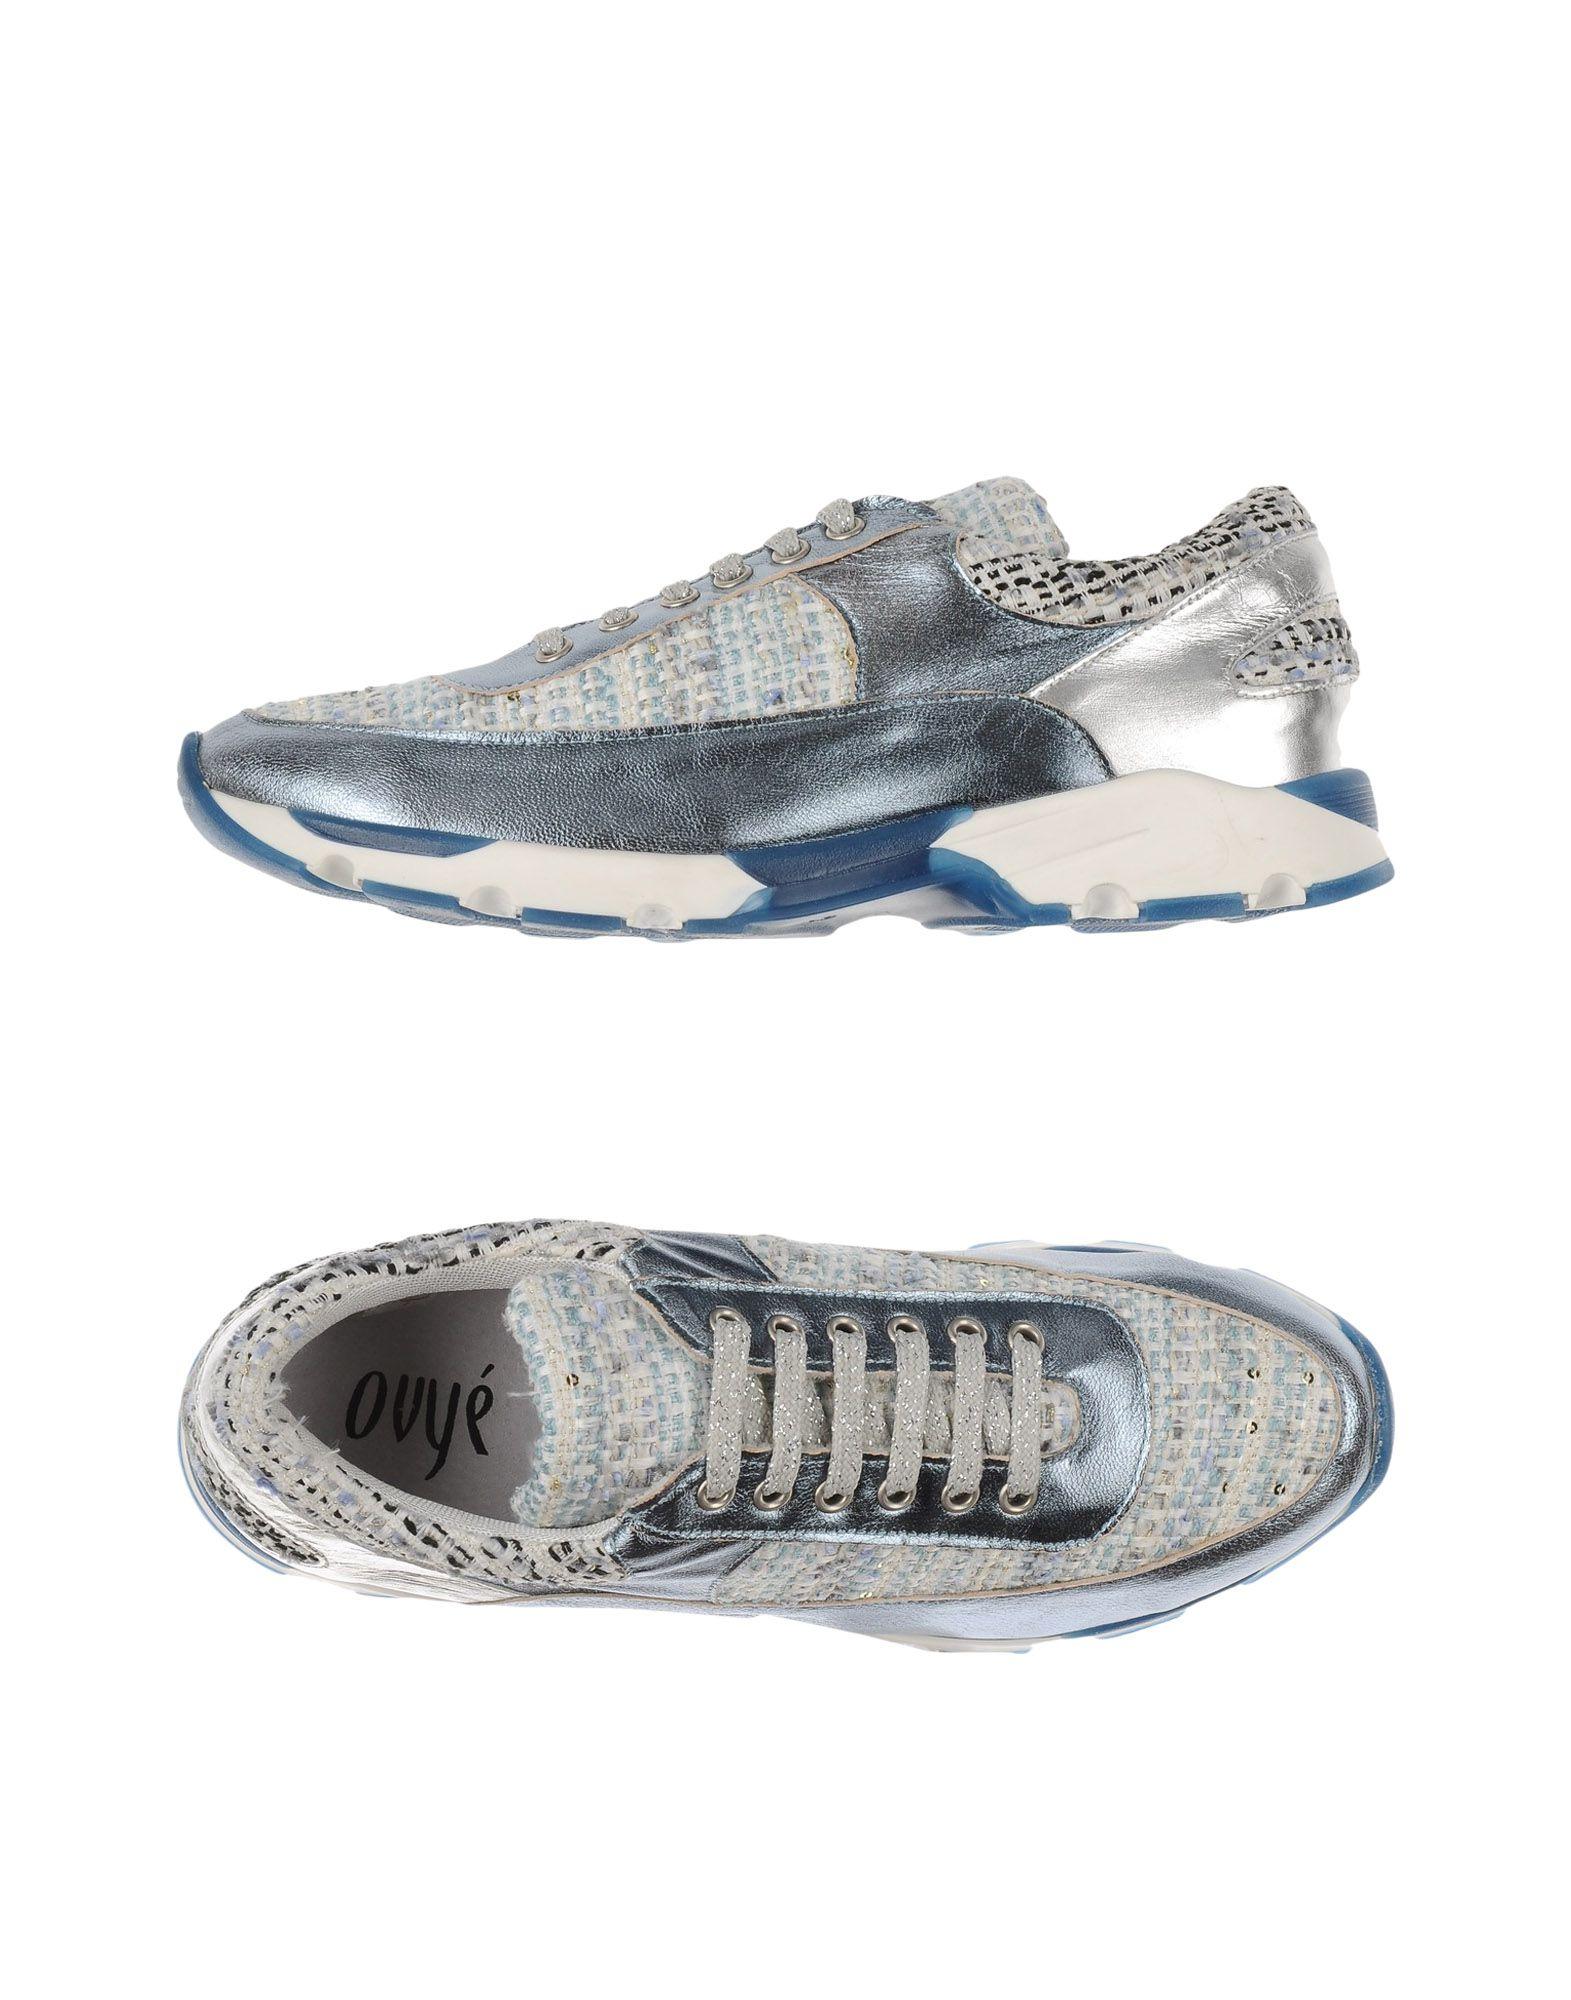 Ovye' By Cristina Lucchi Gute Sneakers Damen  44957748QJ Gute Lucchi Qualität beliebte Schuhe 32ea83